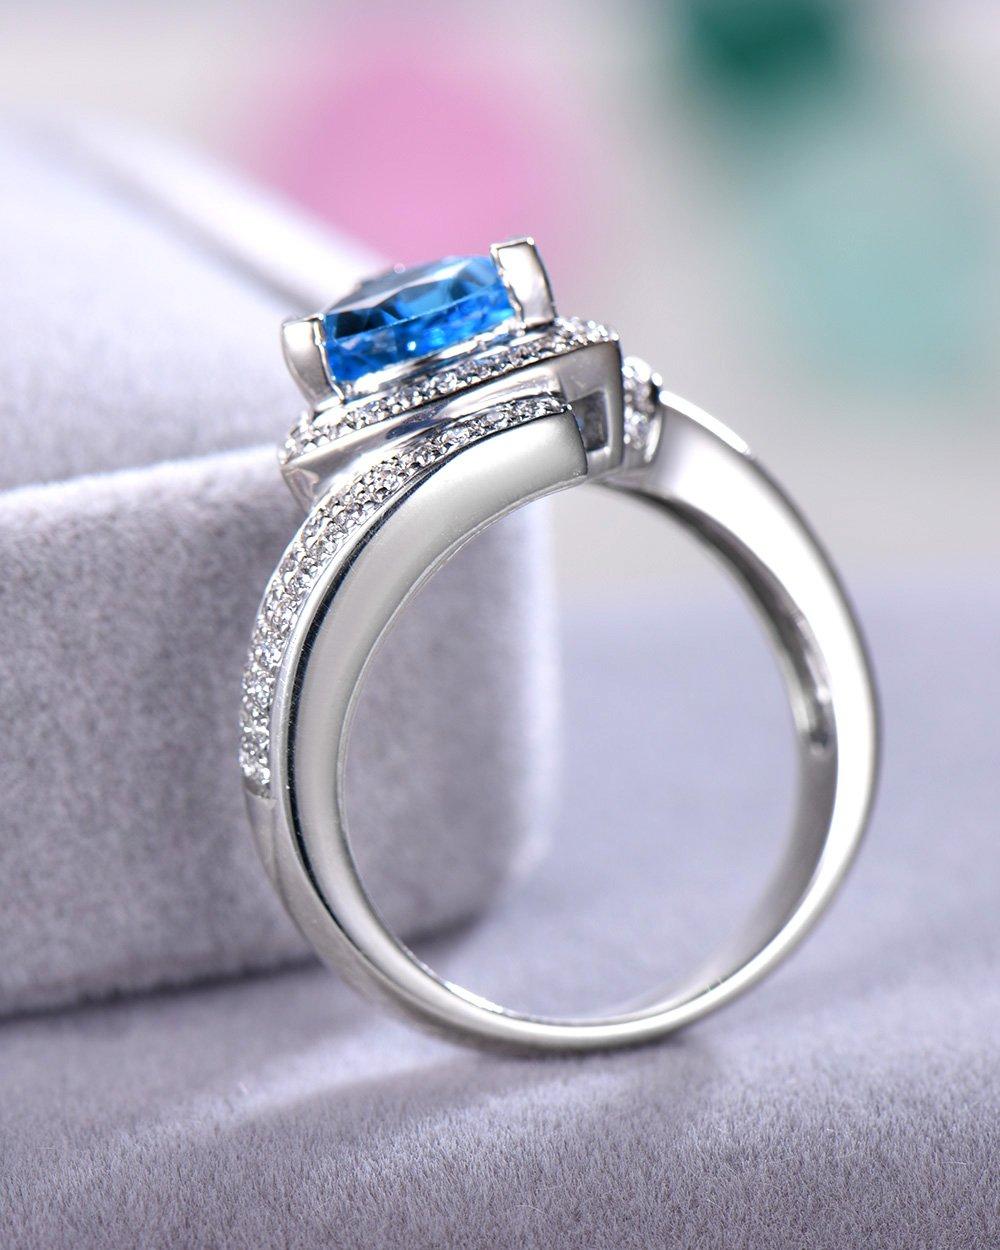 Blue Topaz Wedding Ring Trillion Cut 925 Sterling Silver White Gold CZ Diamond Halo Unique Engagement Set by Milejewel Topaz Engagement Ring (Image #5)